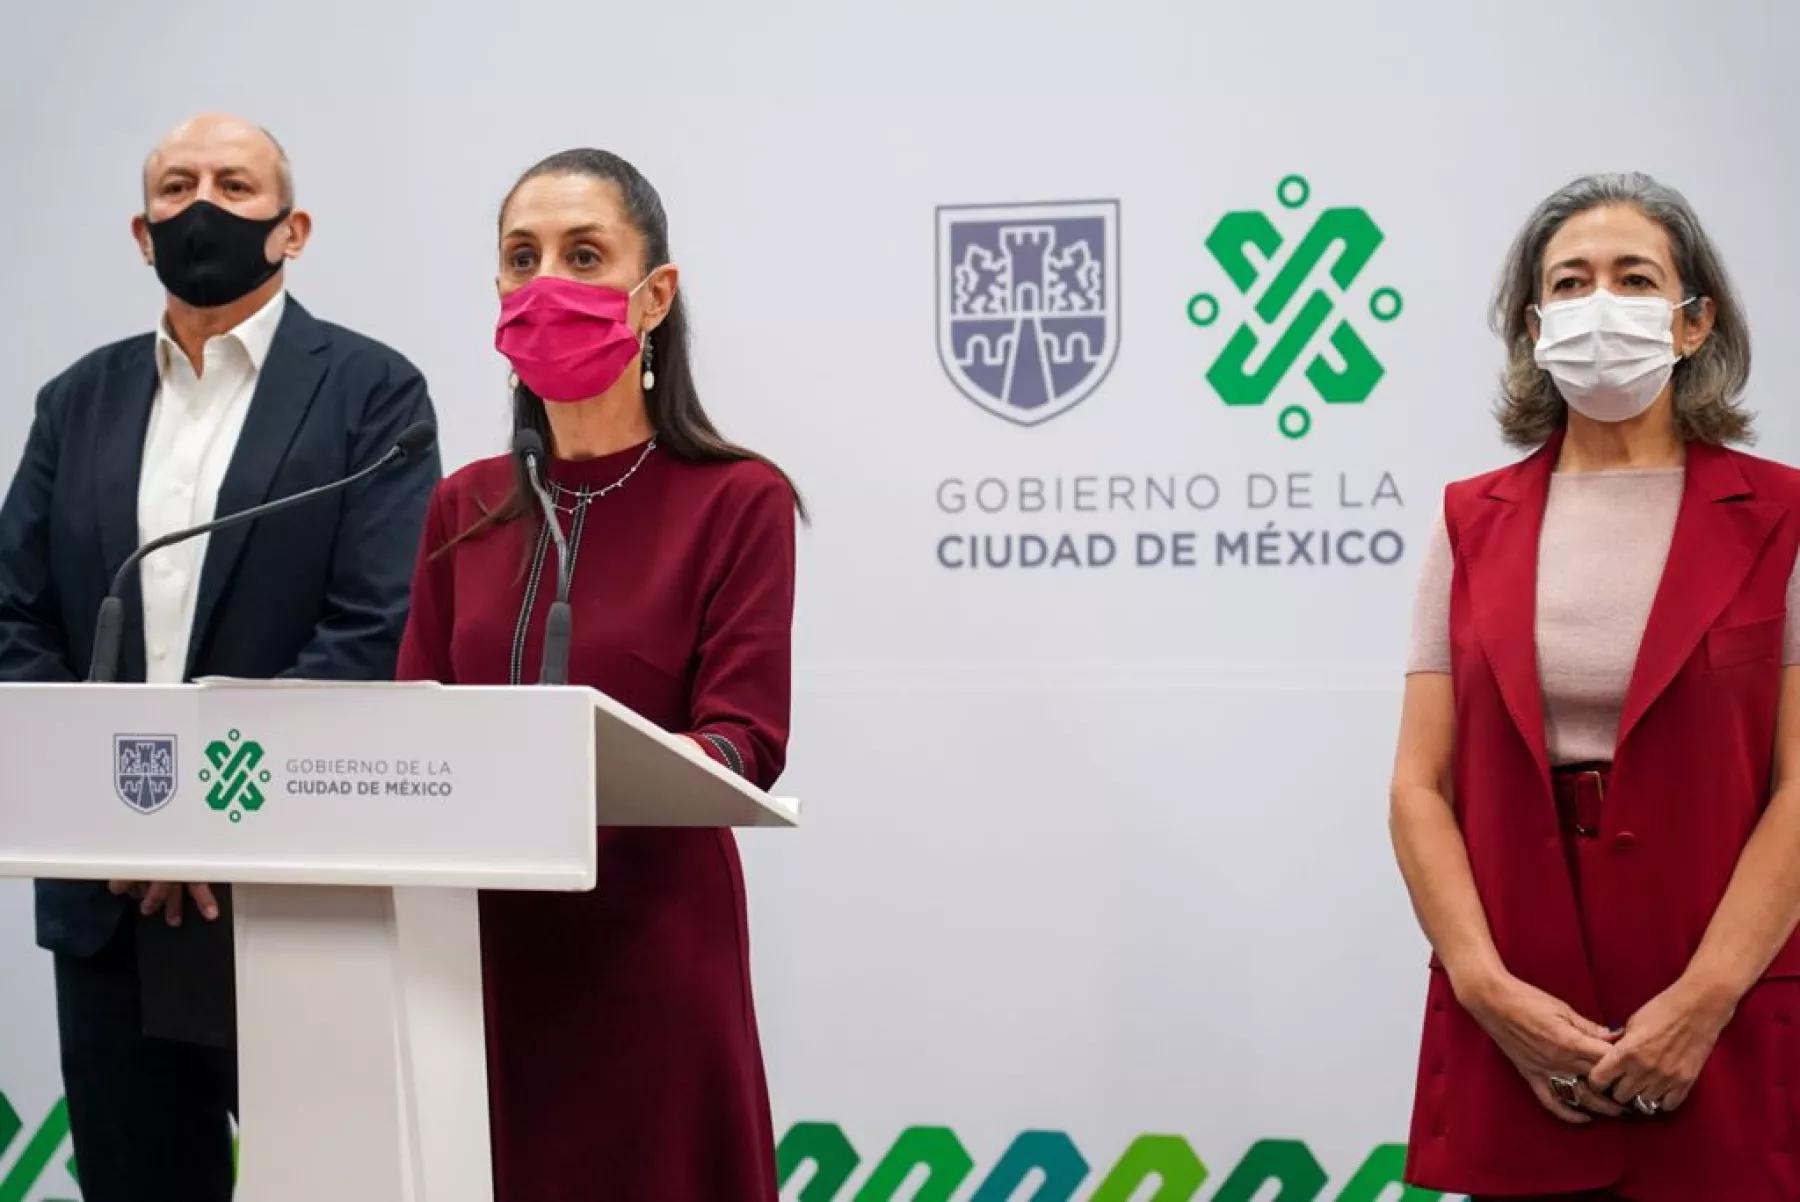 Guillermo Calderon sustituye a Florencia Serrania Claudia Sheinbaum cdmx press